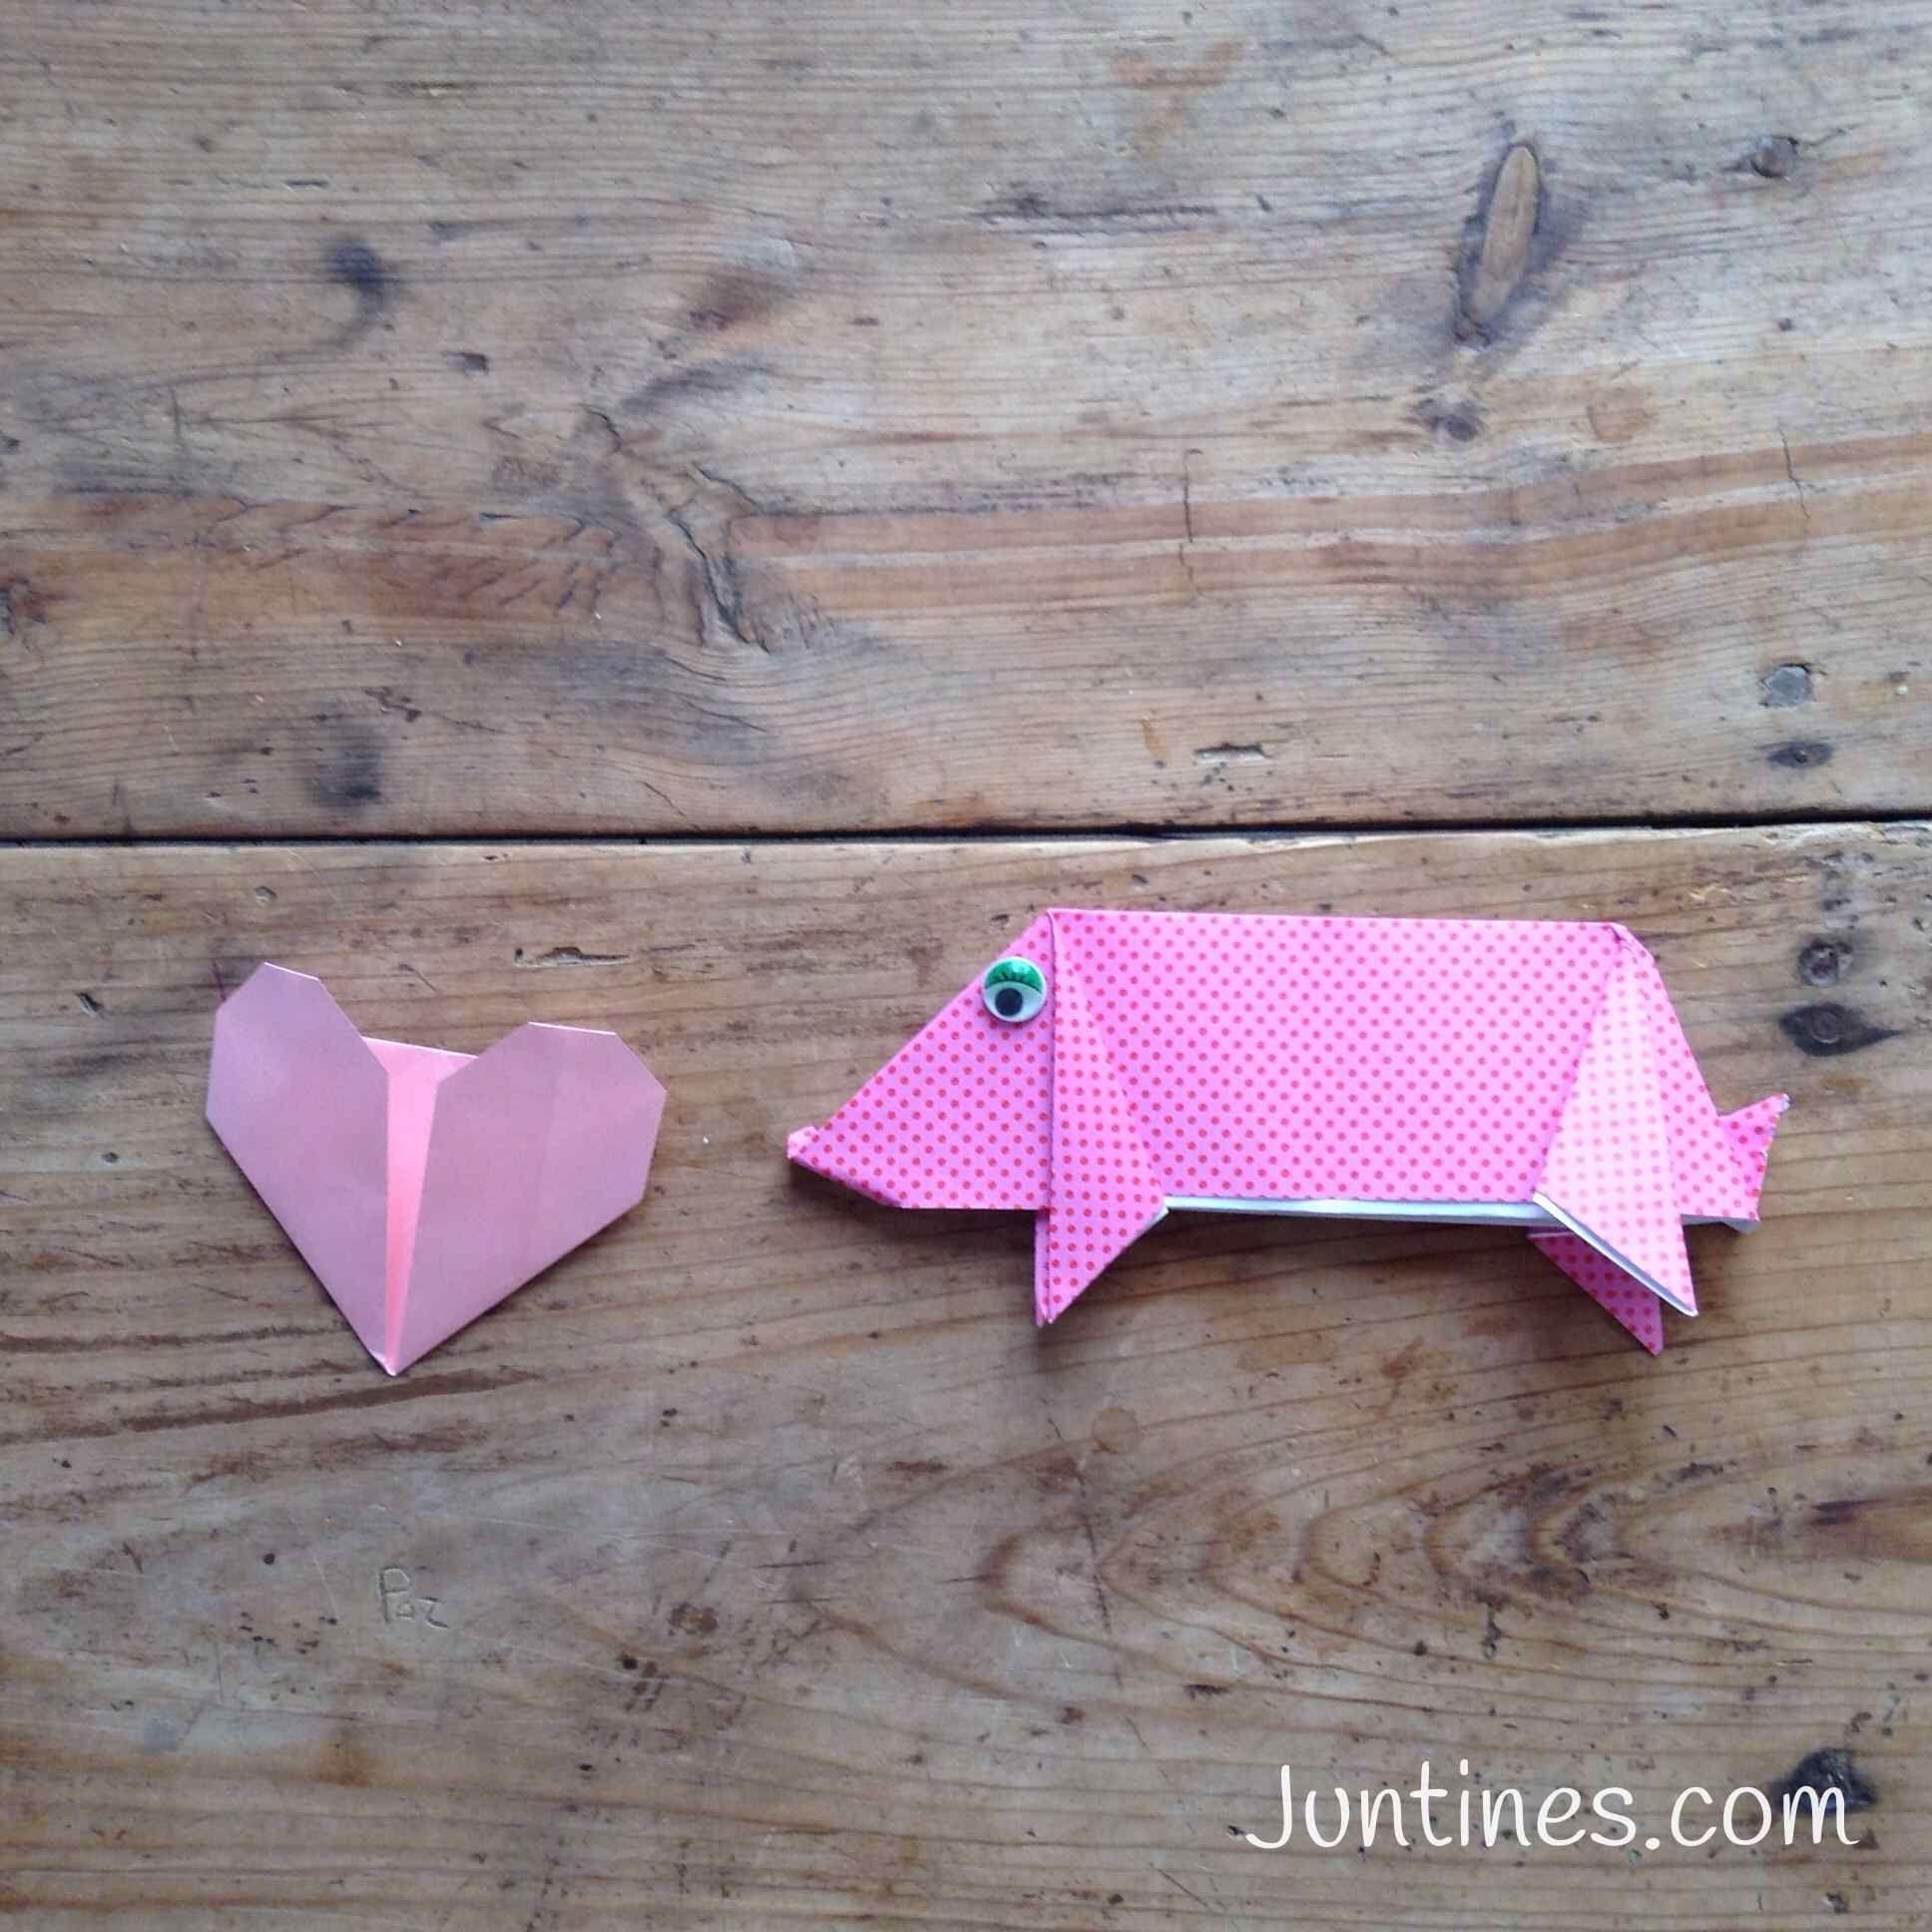 Origami cerdo- Origami fácil - Origami para niños ... - photo#13